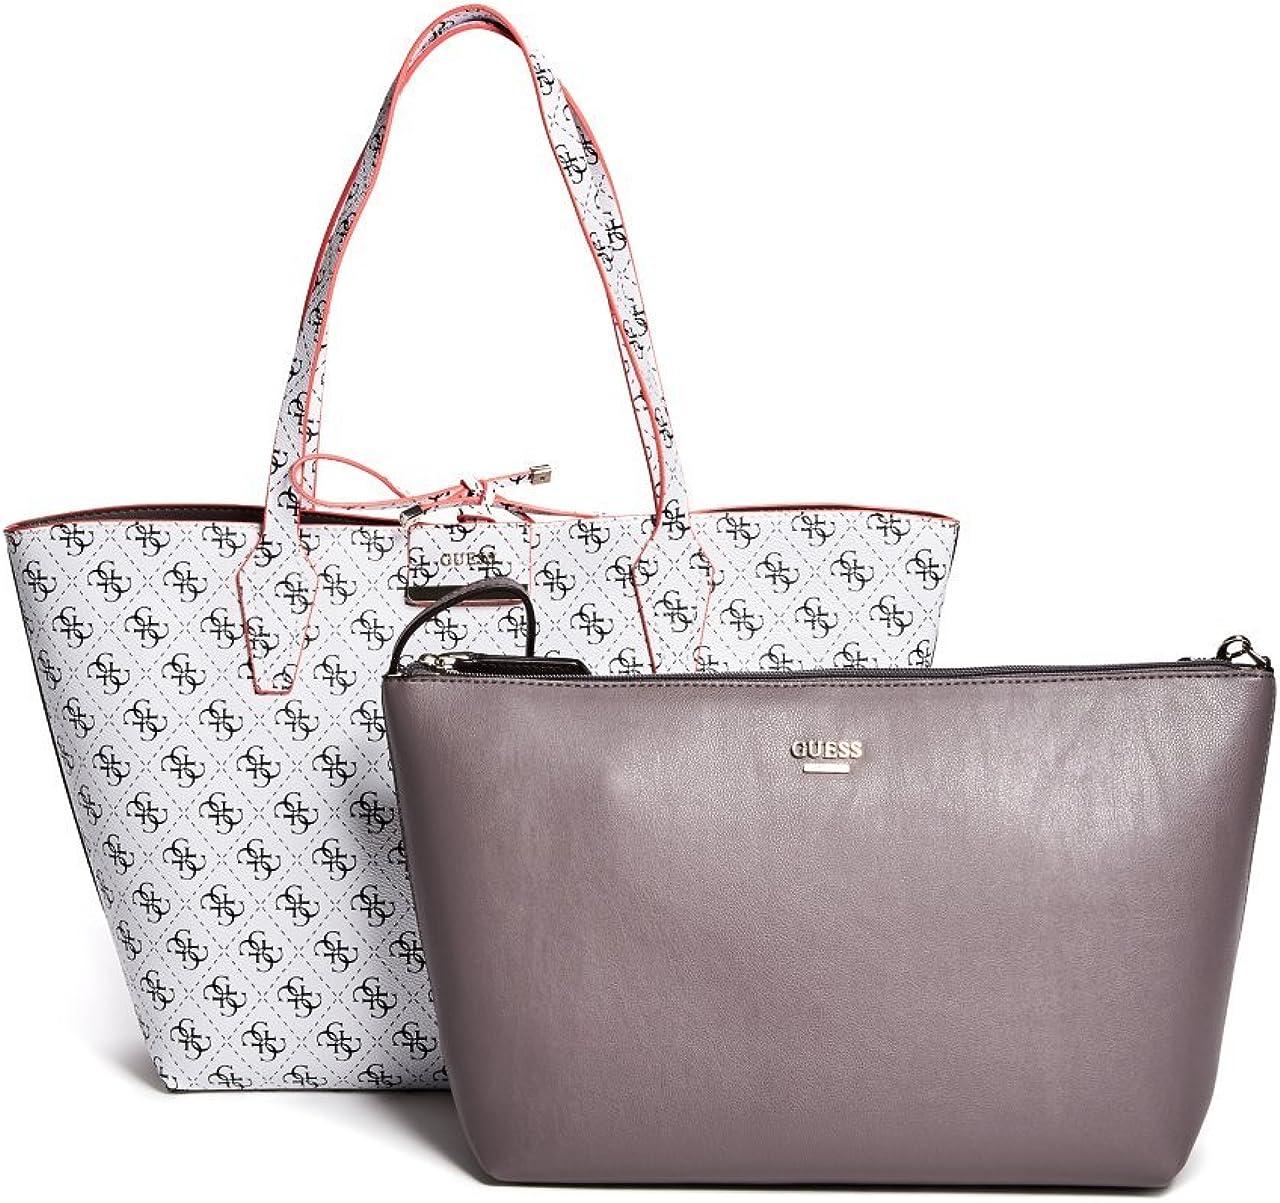 GUESS Bobbi Inside Out Reversible Shopper Travel Tote Bag Handbag Removable Pouch 2PC – White